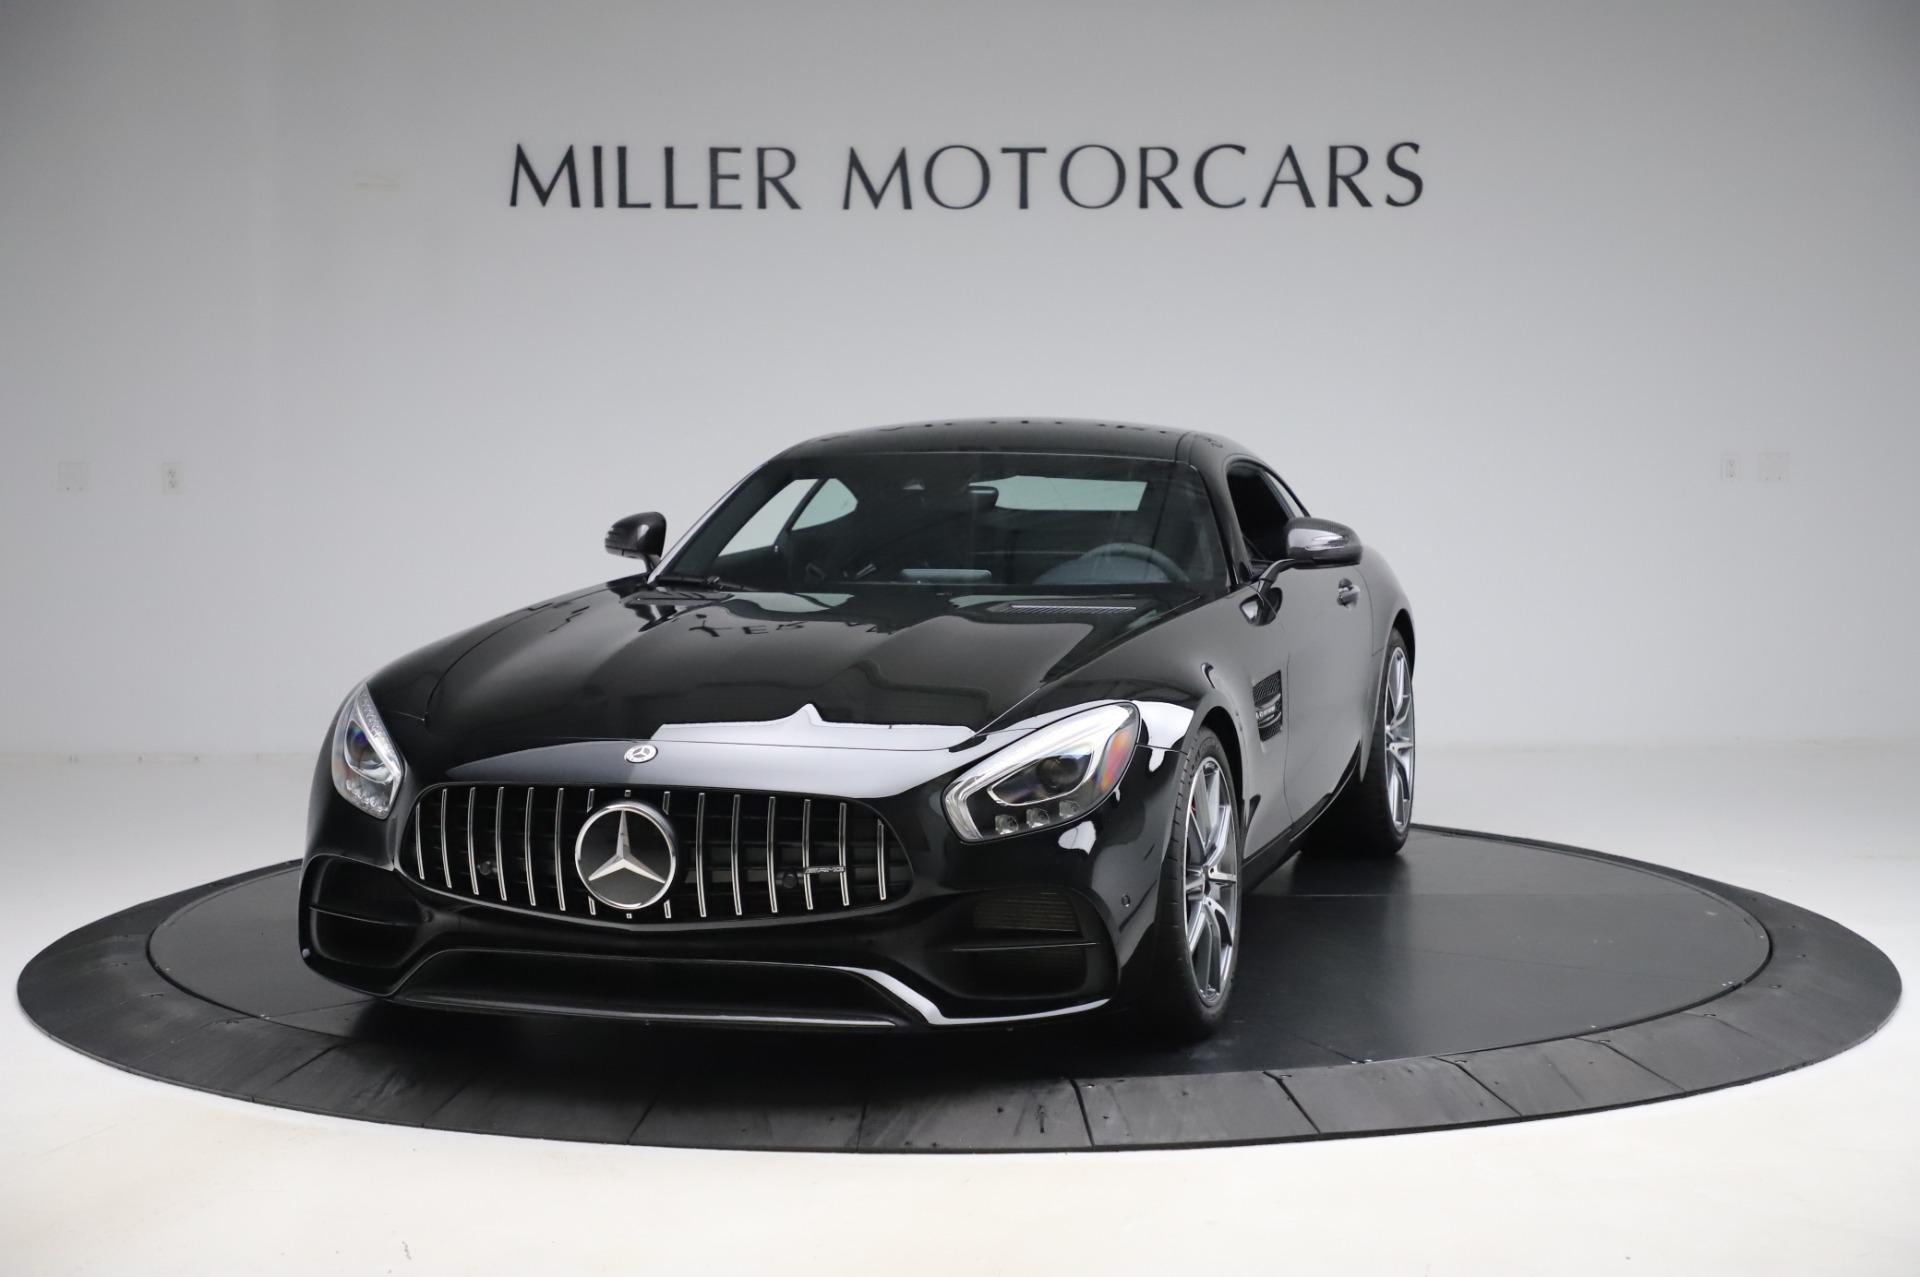 Used 2018 Mercedes-Benz AMG GT S for sale $103,900 at Alfa Romeo of Westport in Westport CT 06880 1